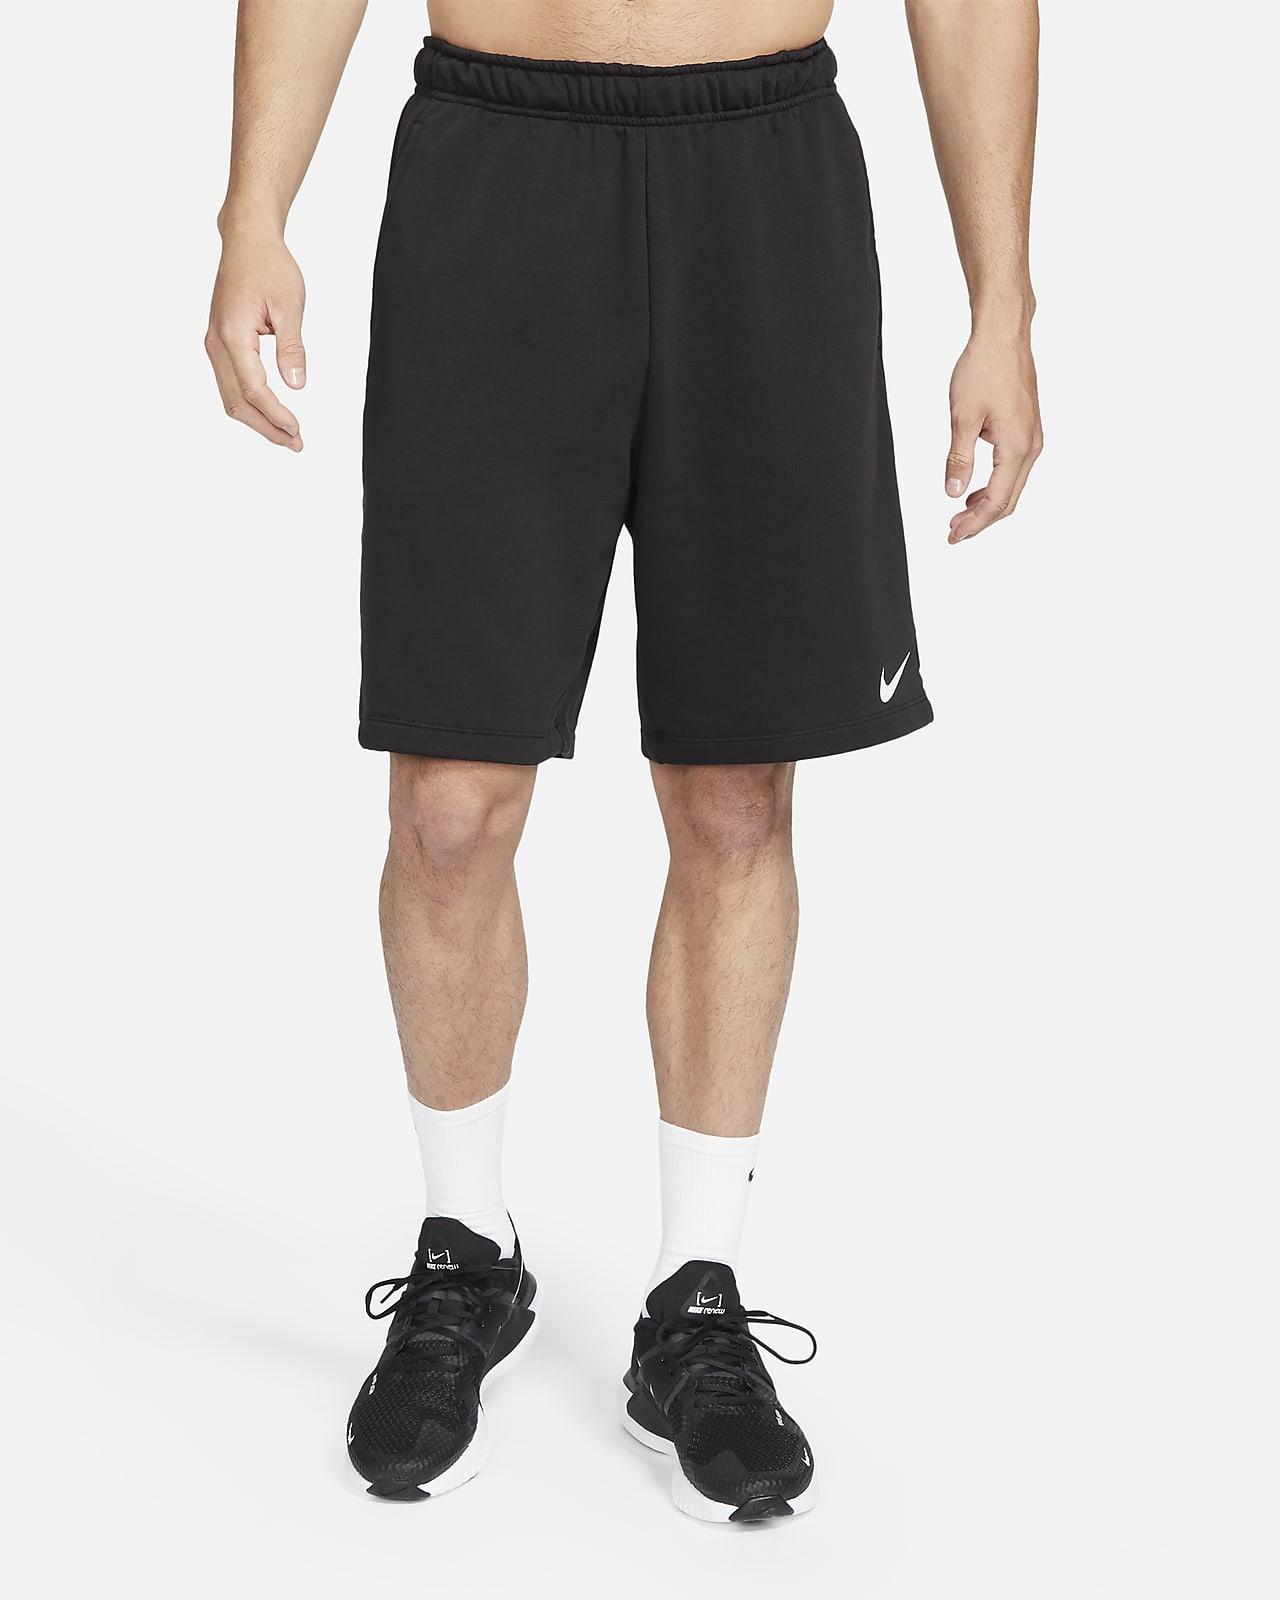 Nike Dri-FIT treningsshorts til herre